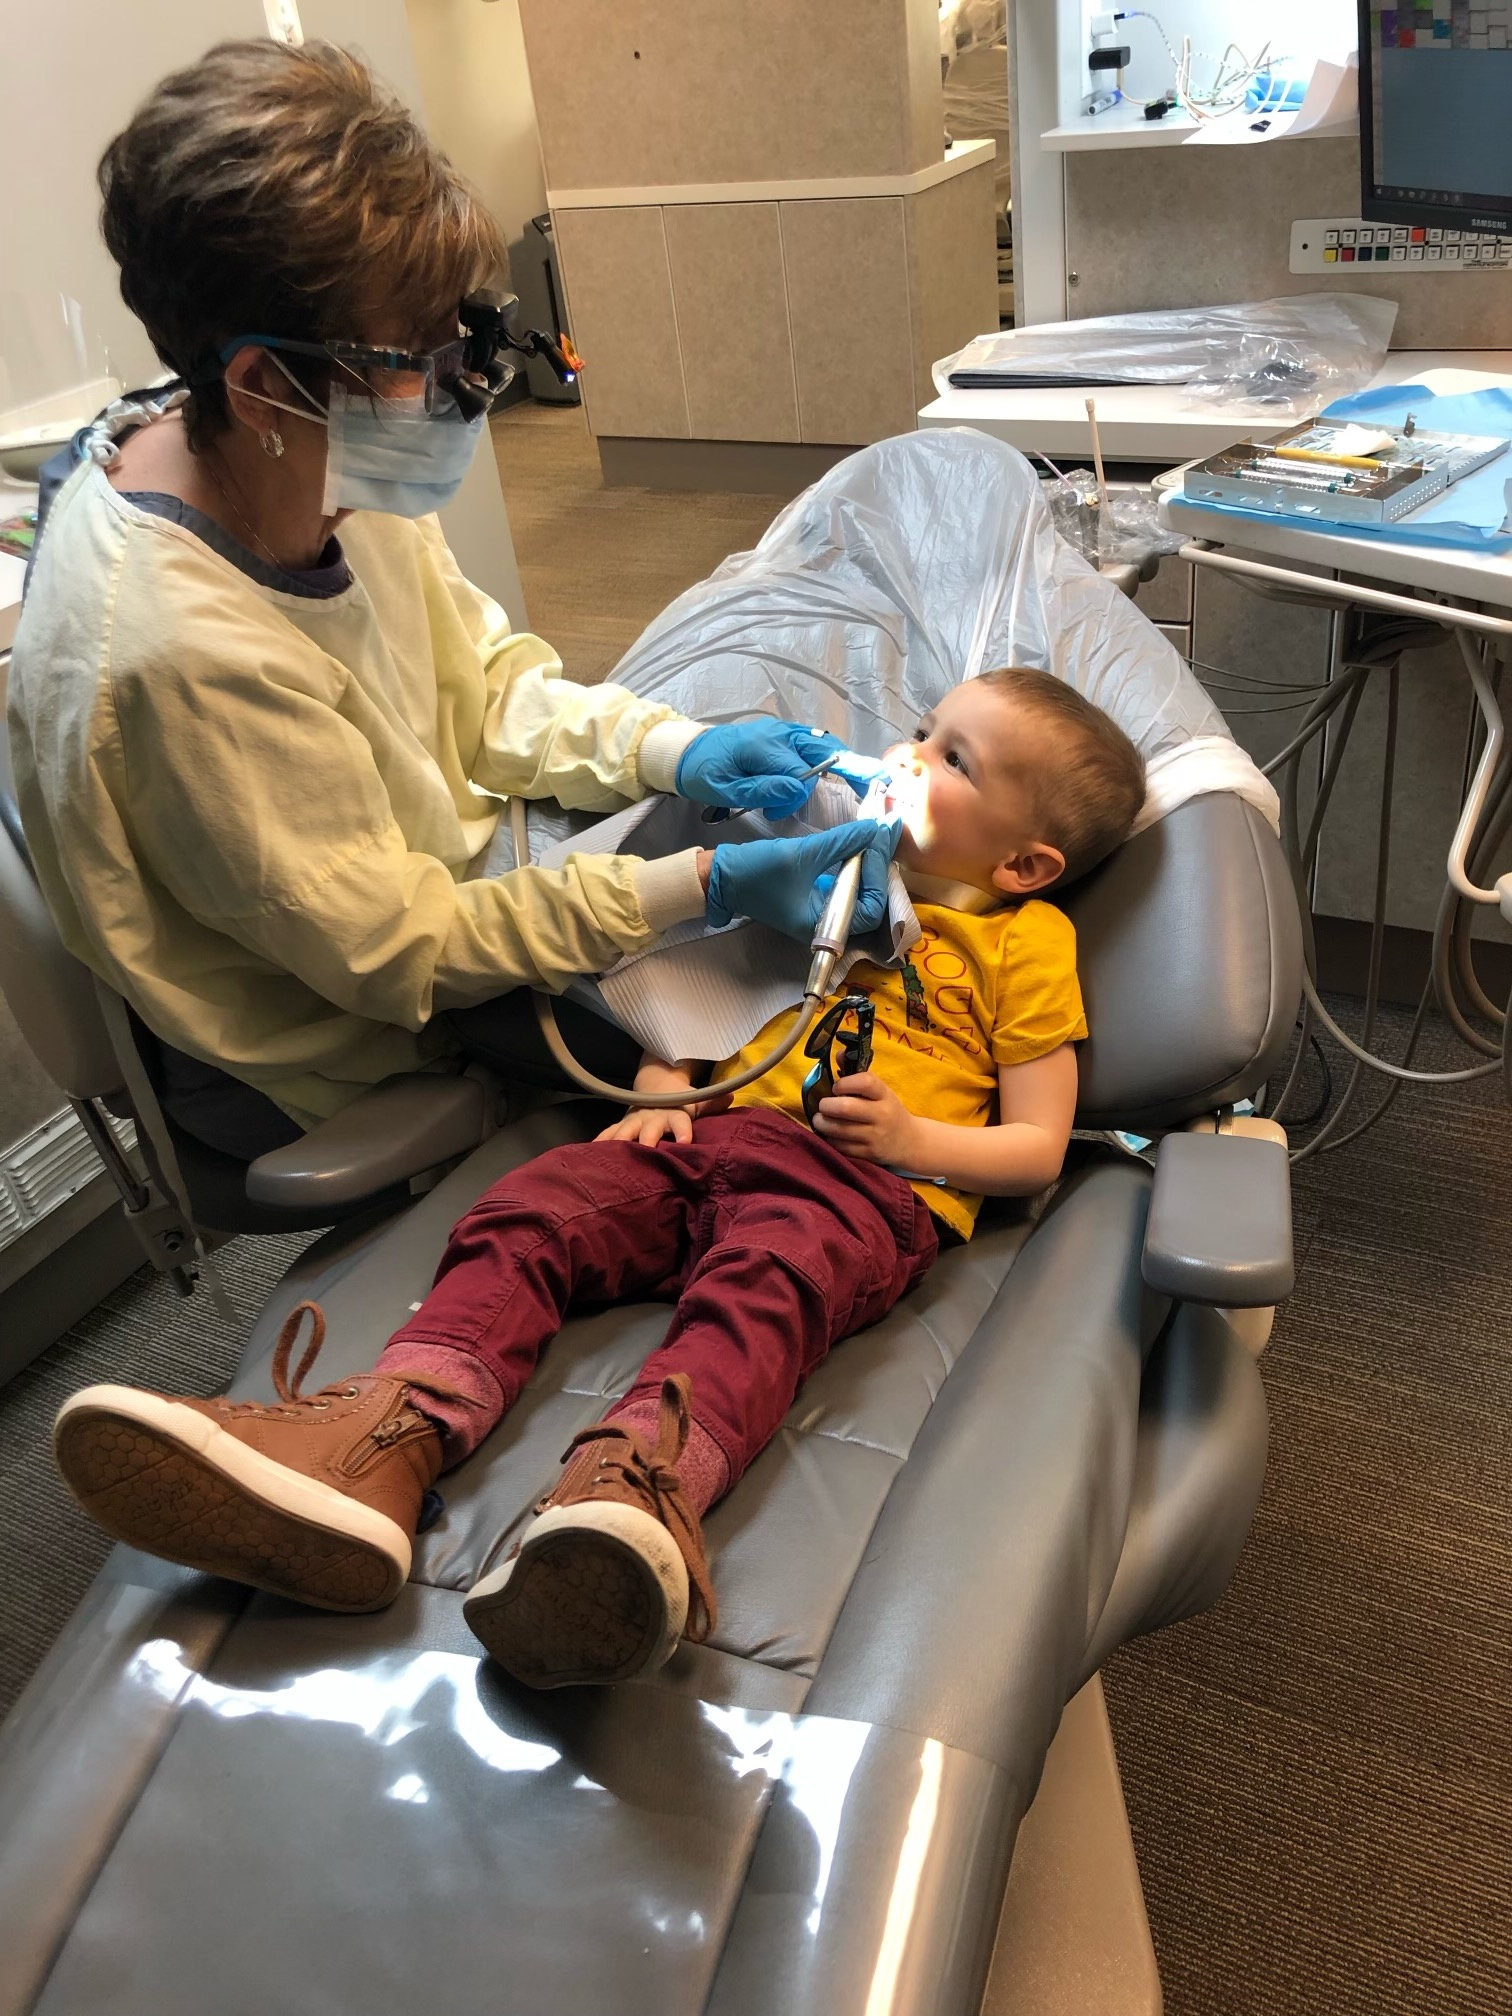 North Creek Dental Care - dentist  | Photo 6 of 6 | Address: 18425 W Creek Dr, Tinley Park, IL 60477, USA | Phone: (708) 532-4131